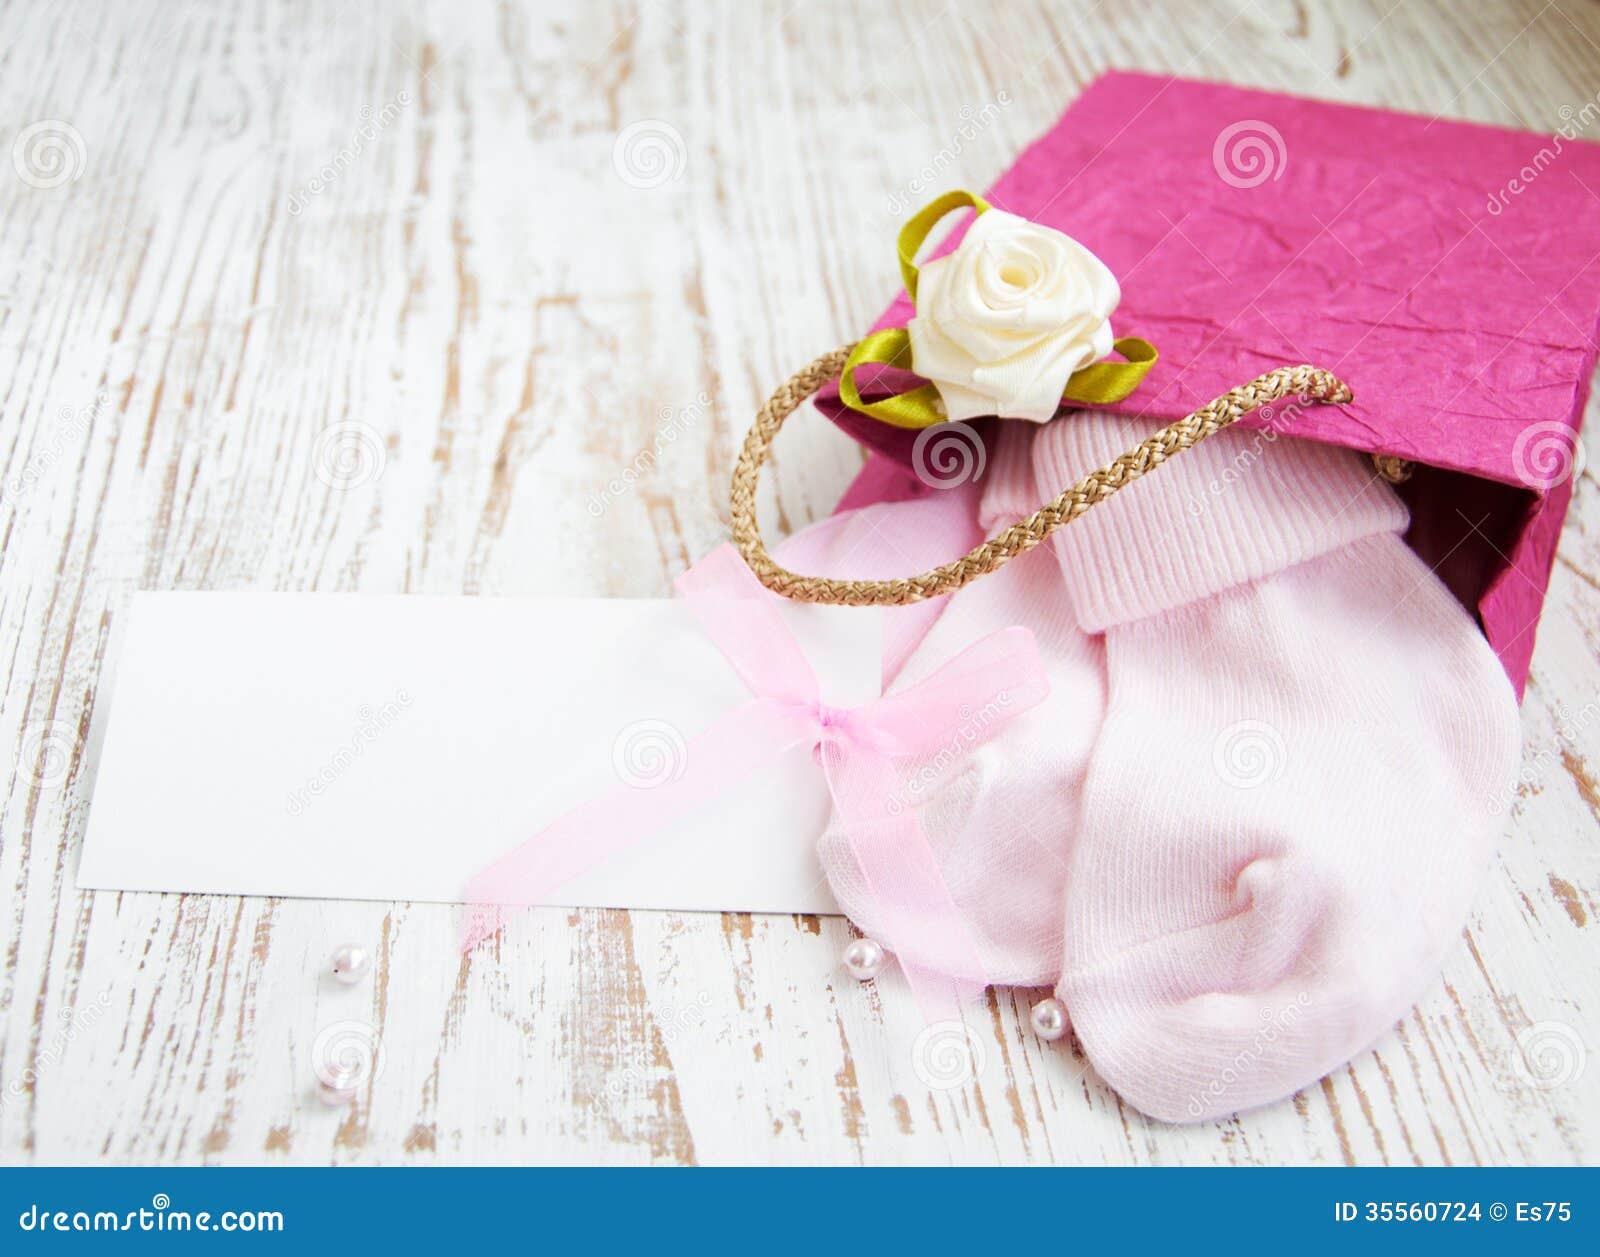 Newborn Baby Greeting Stock Photo Image Of Ribbon Lifestyle 35560724